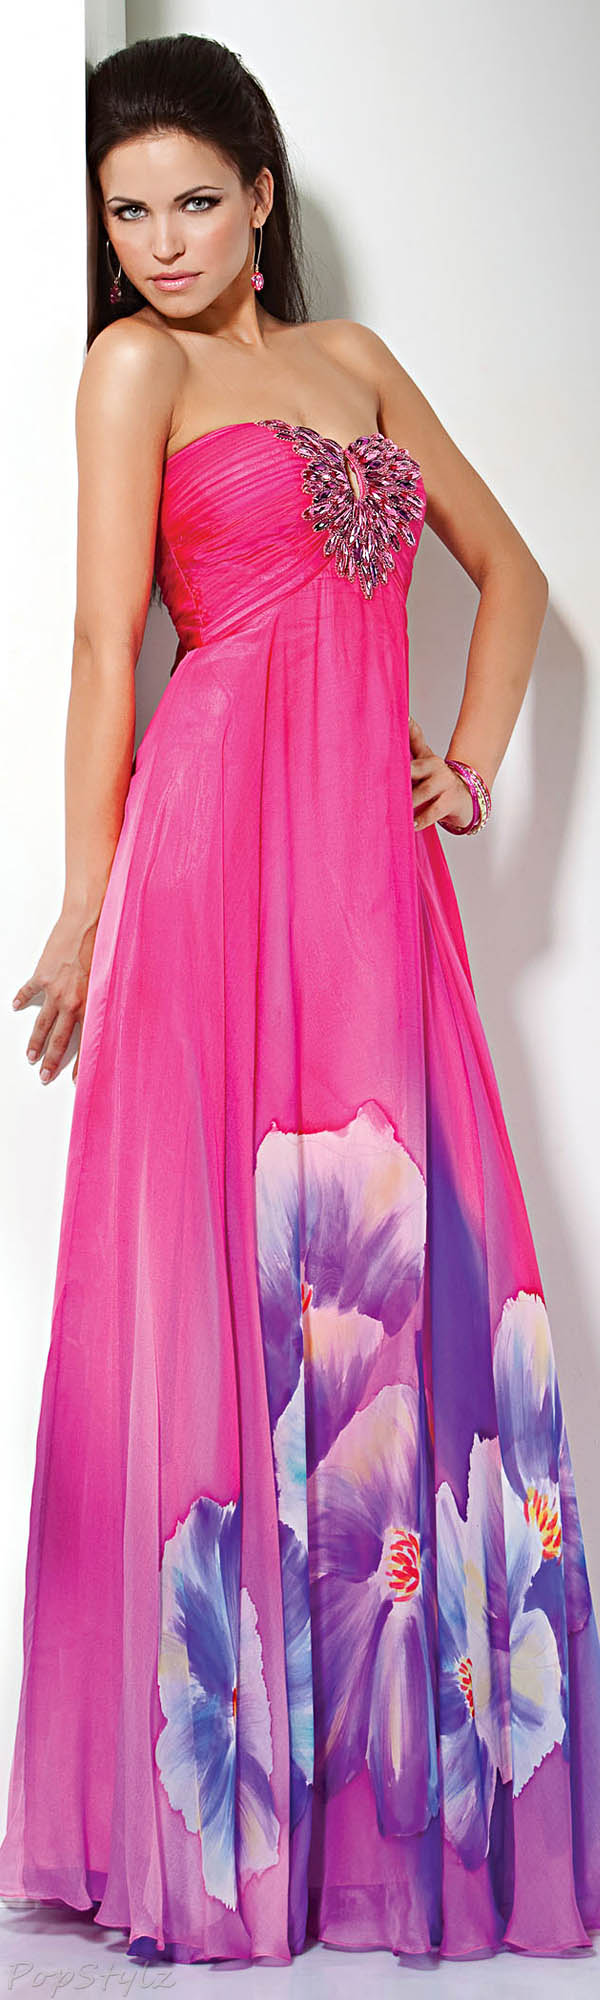 Jovani 158840 Evening Gown | sacos | Pinterest | Vestidos de noche ...